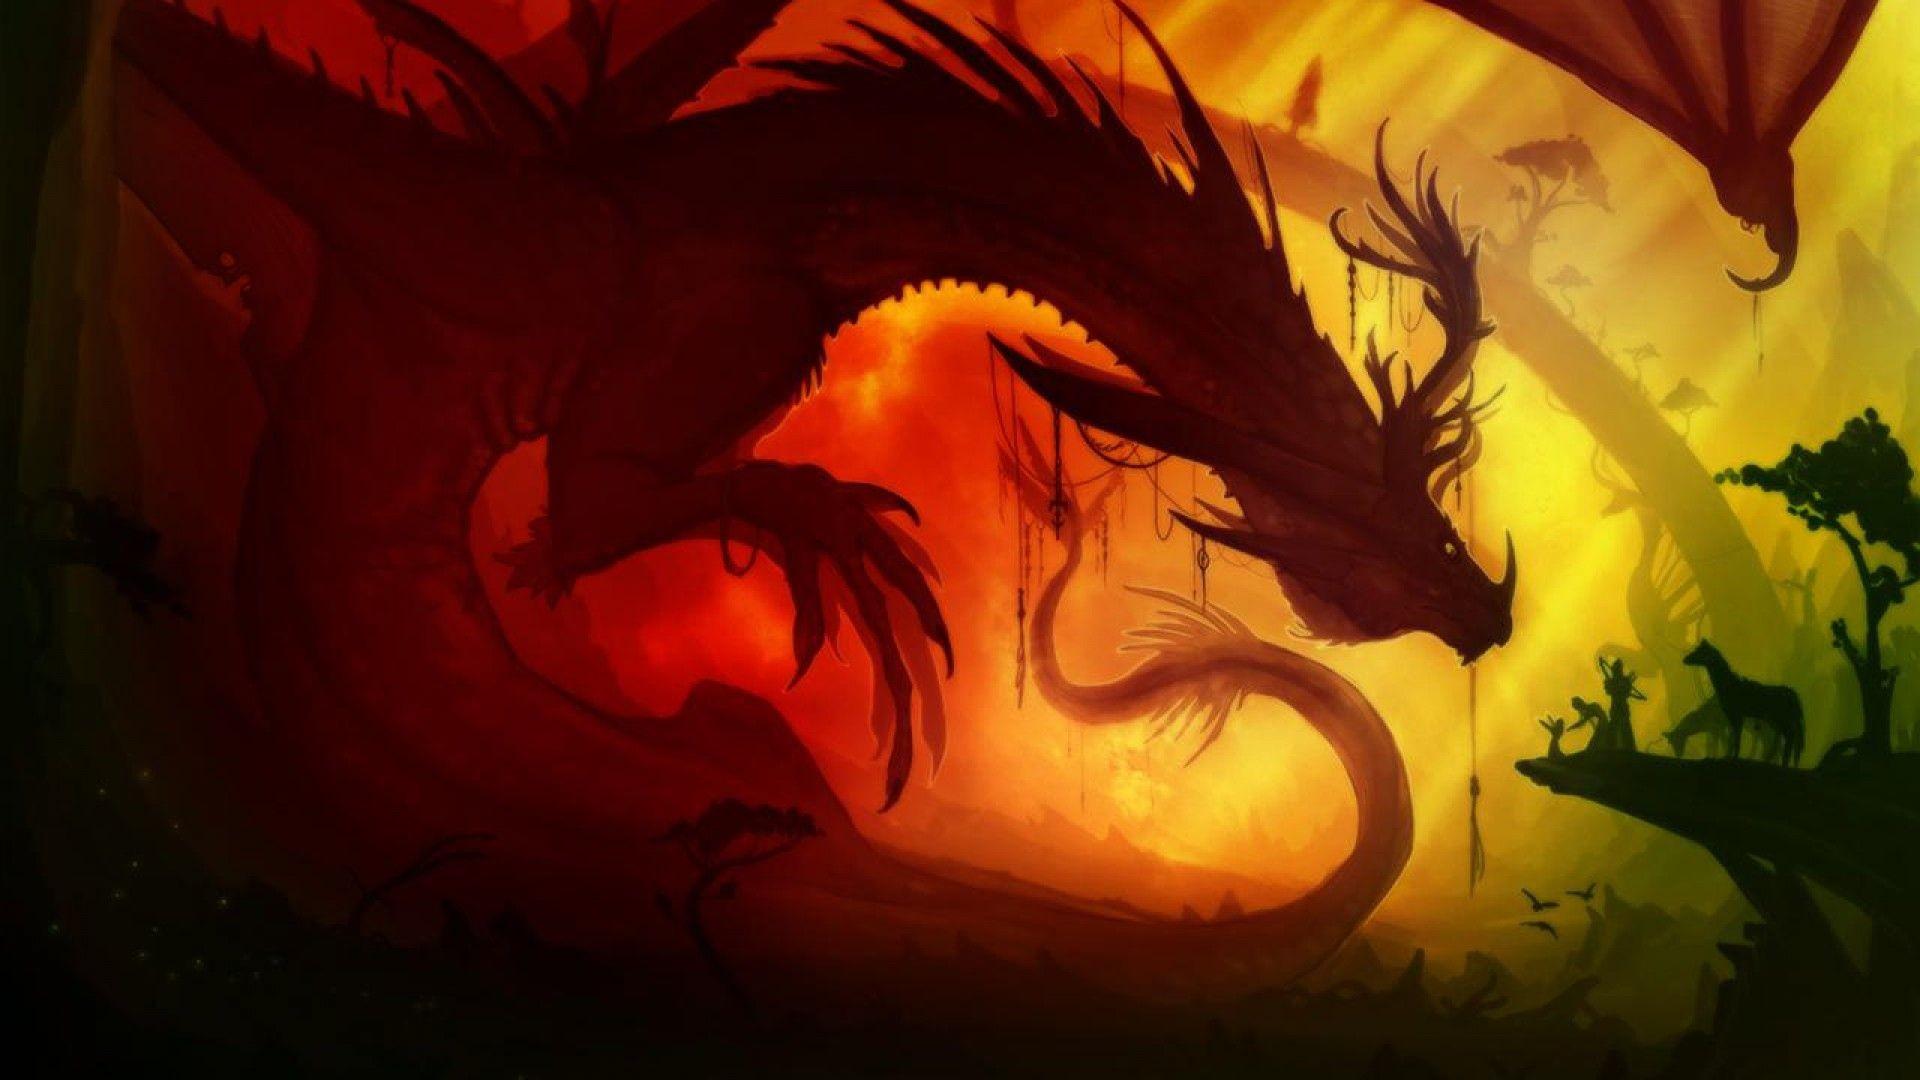 Dragon Hd Wallpapers 1080p: 4K Dragon Wallpaper (50+ Images